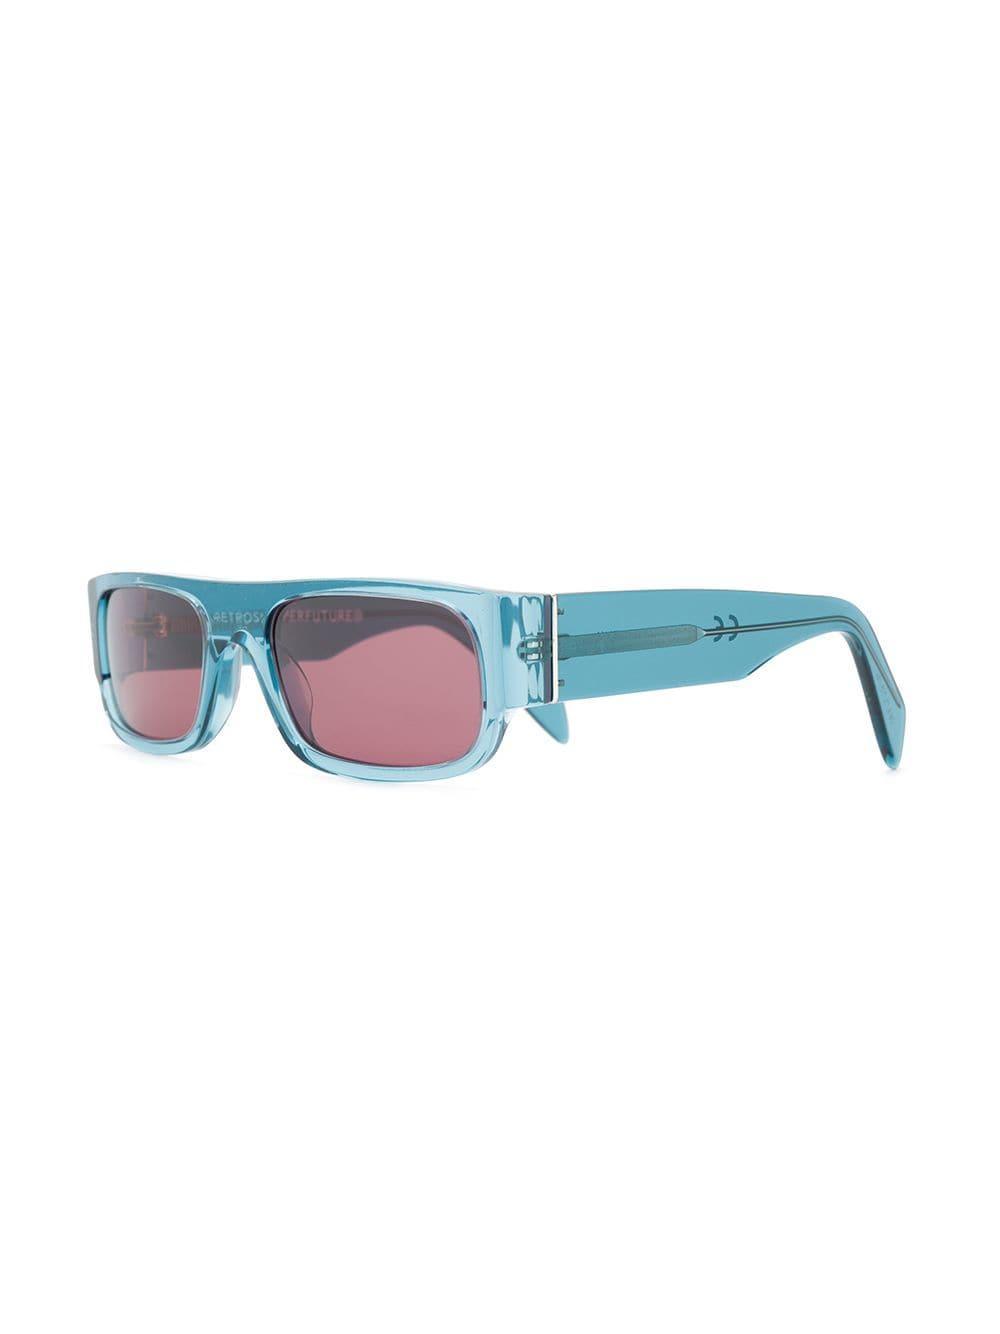 2440dc718b15 Retrosuperfuture Smile Sunglasses in Blue - Lyst